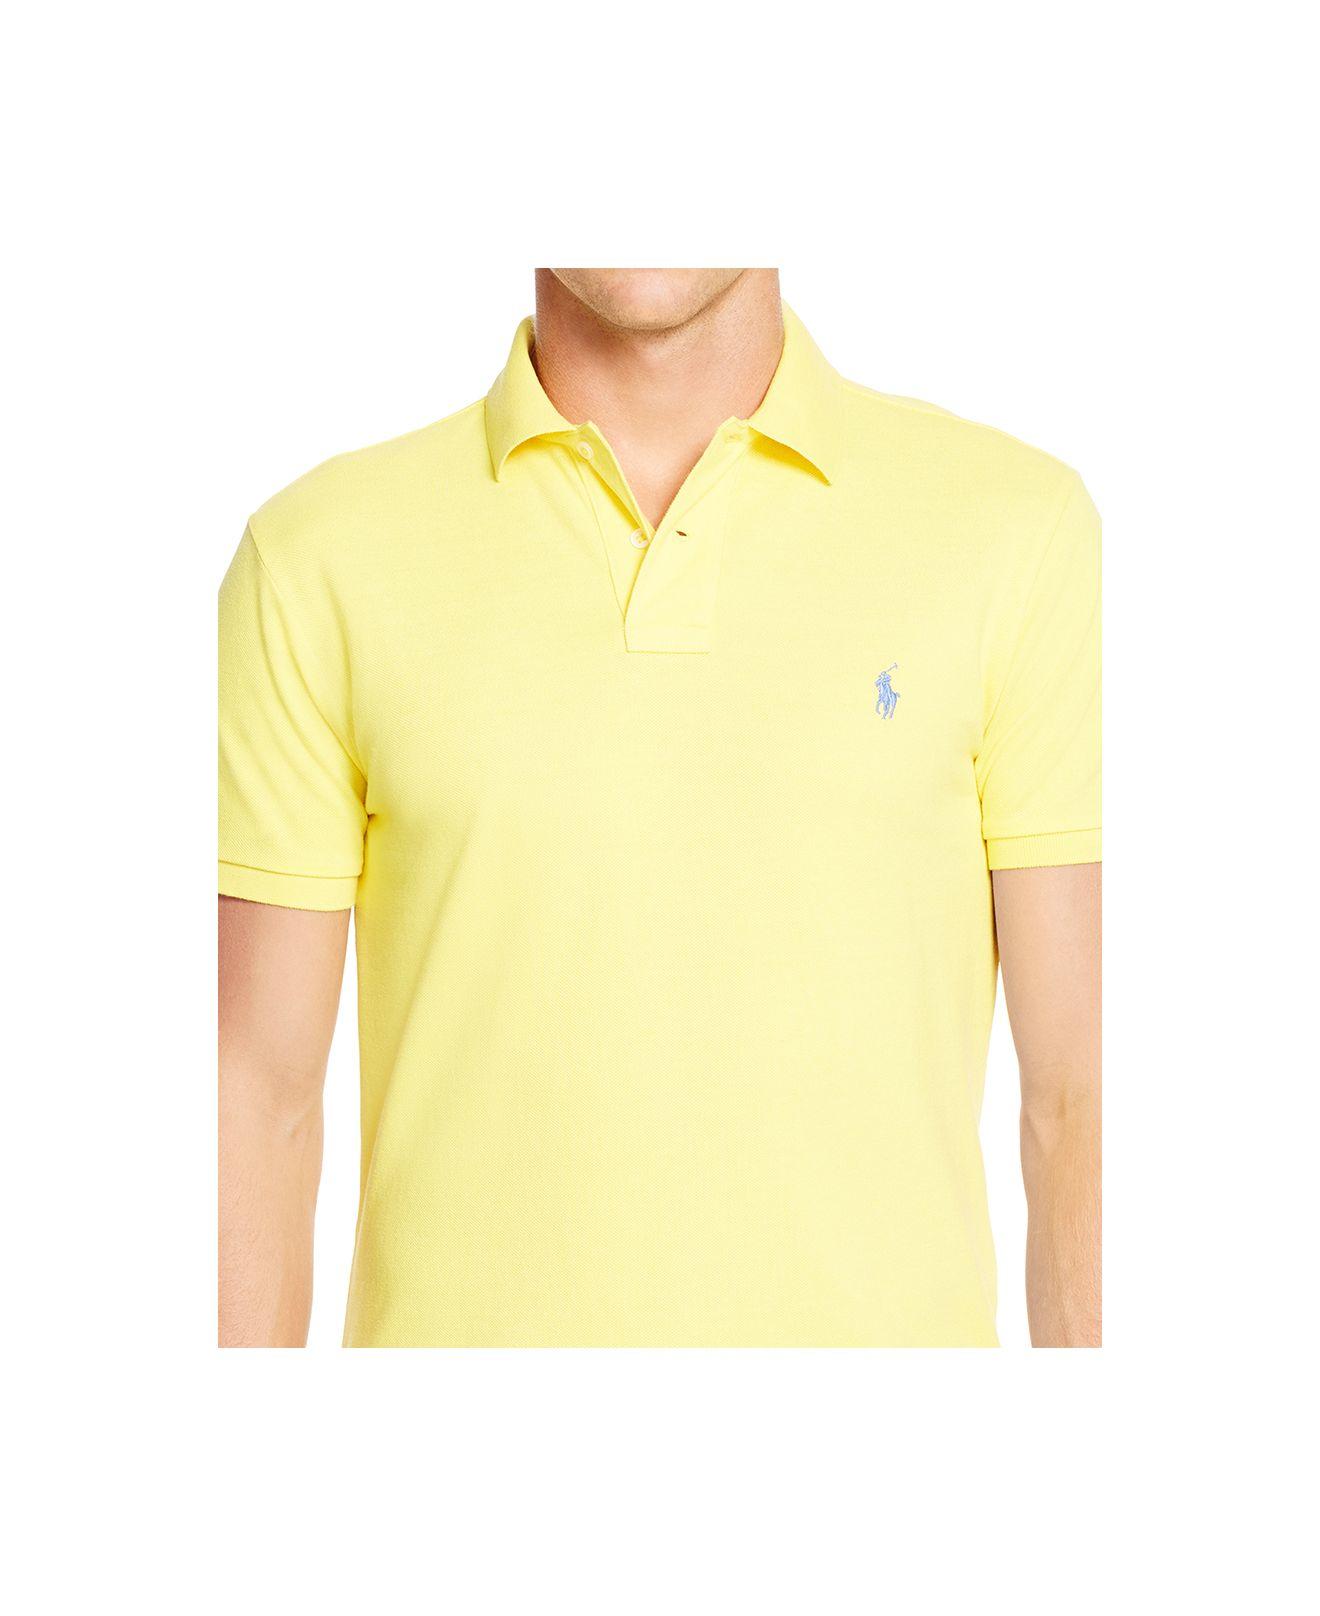 Polo Ralph Lauren Men 39 S Classic Fit Mesh Polo Shirt In